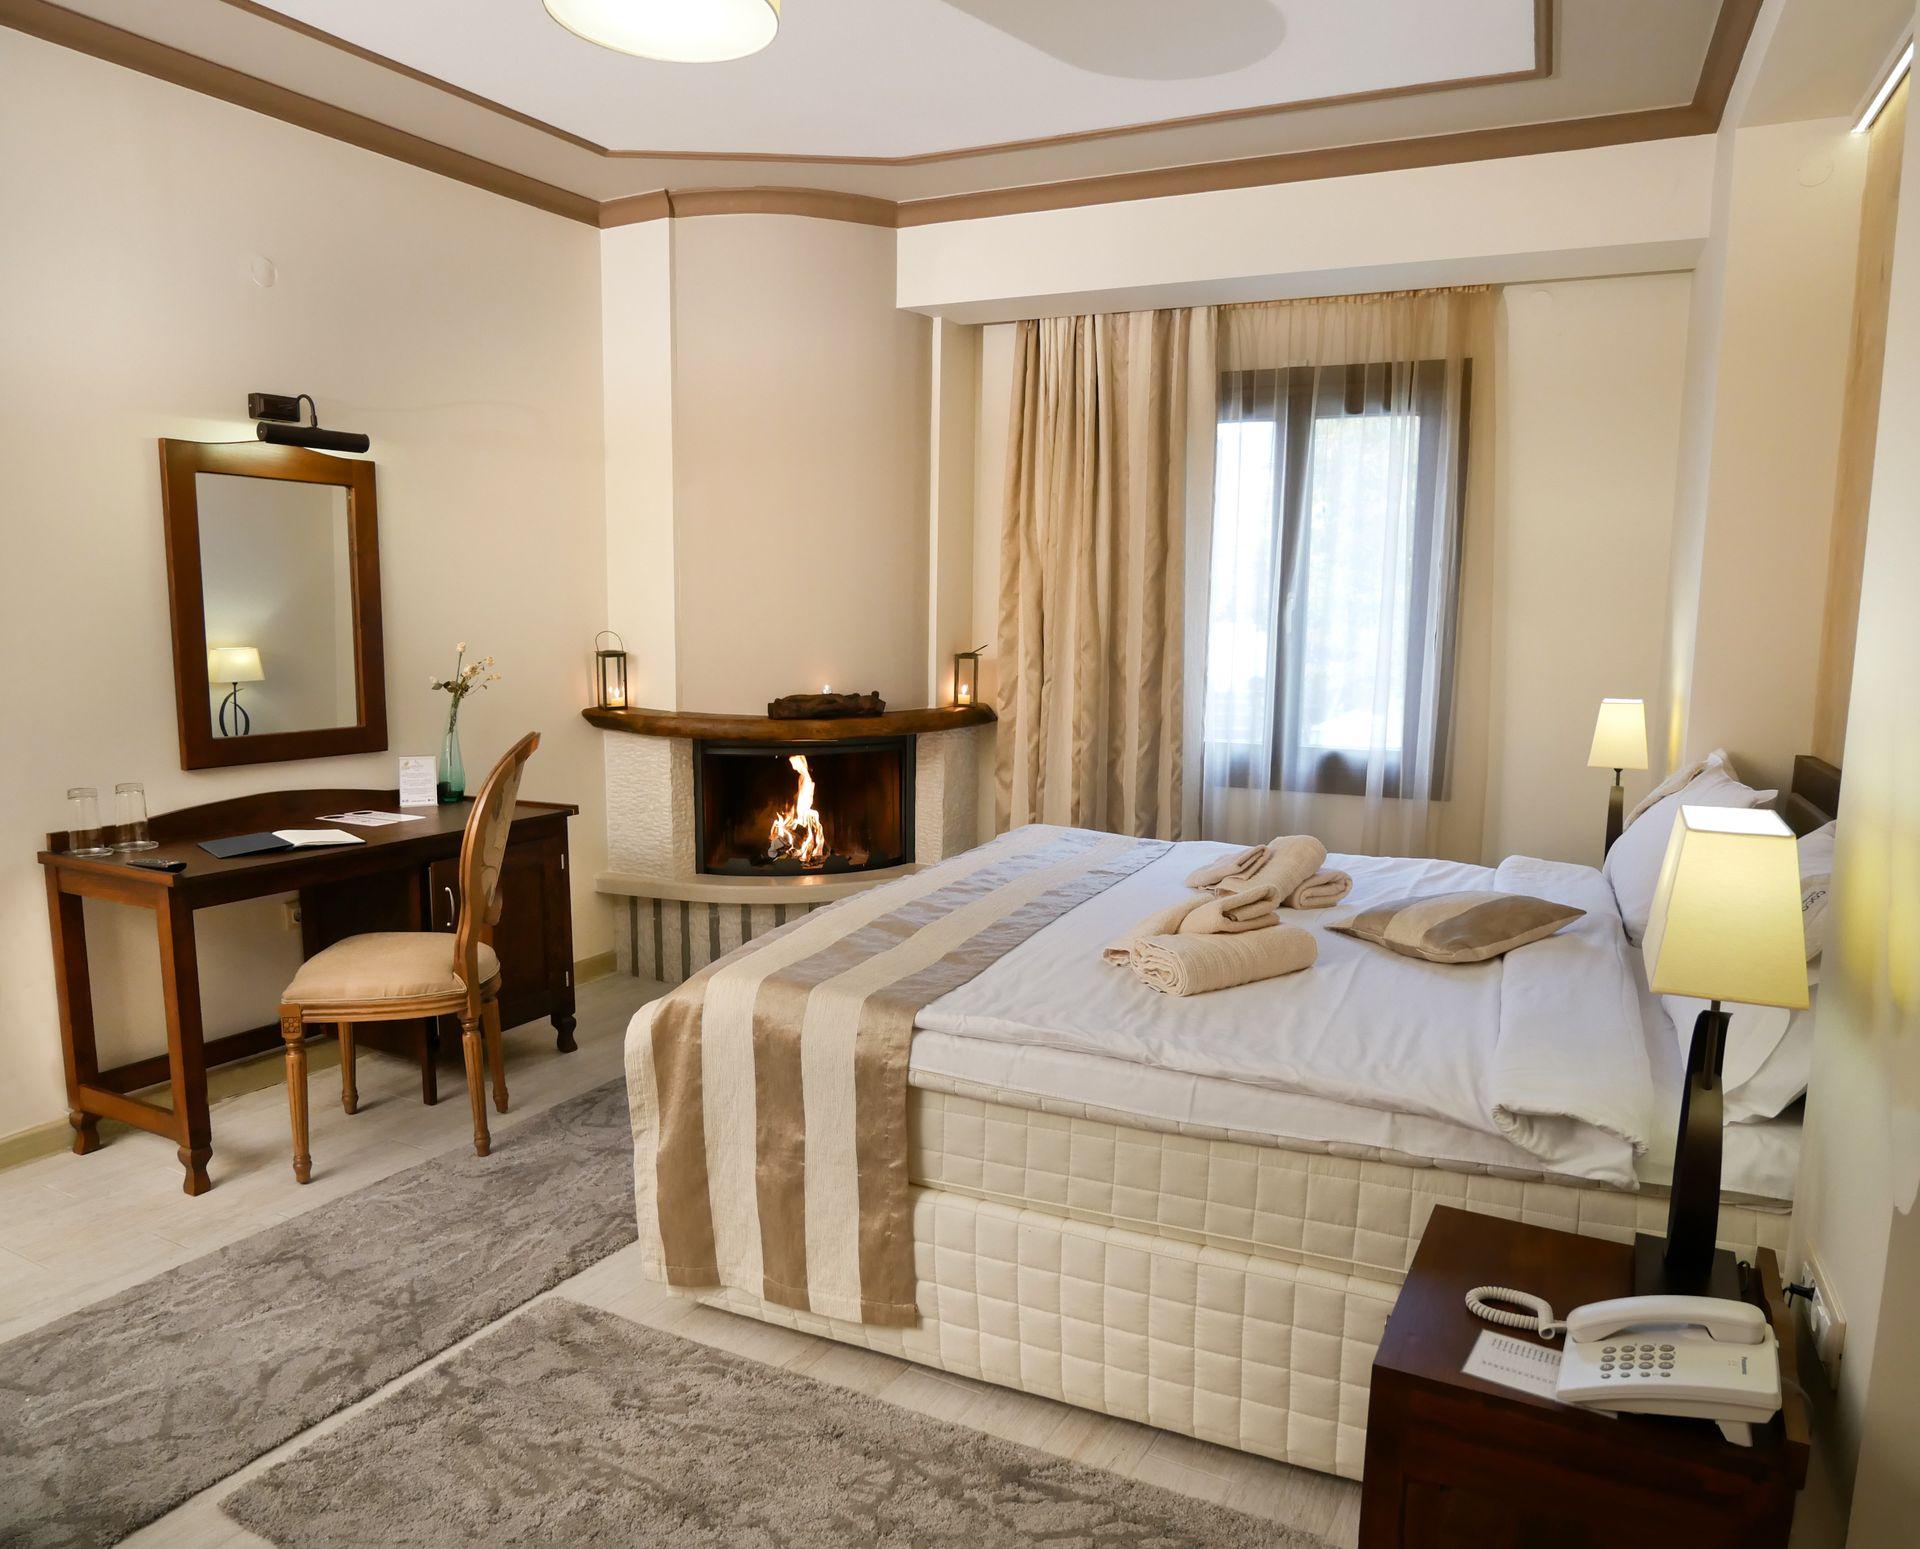 Rodovoli Hotel Konitsa - Κόνιτσα ✦ 4 Ημέρες (3 Διανυκτερεύσεις)